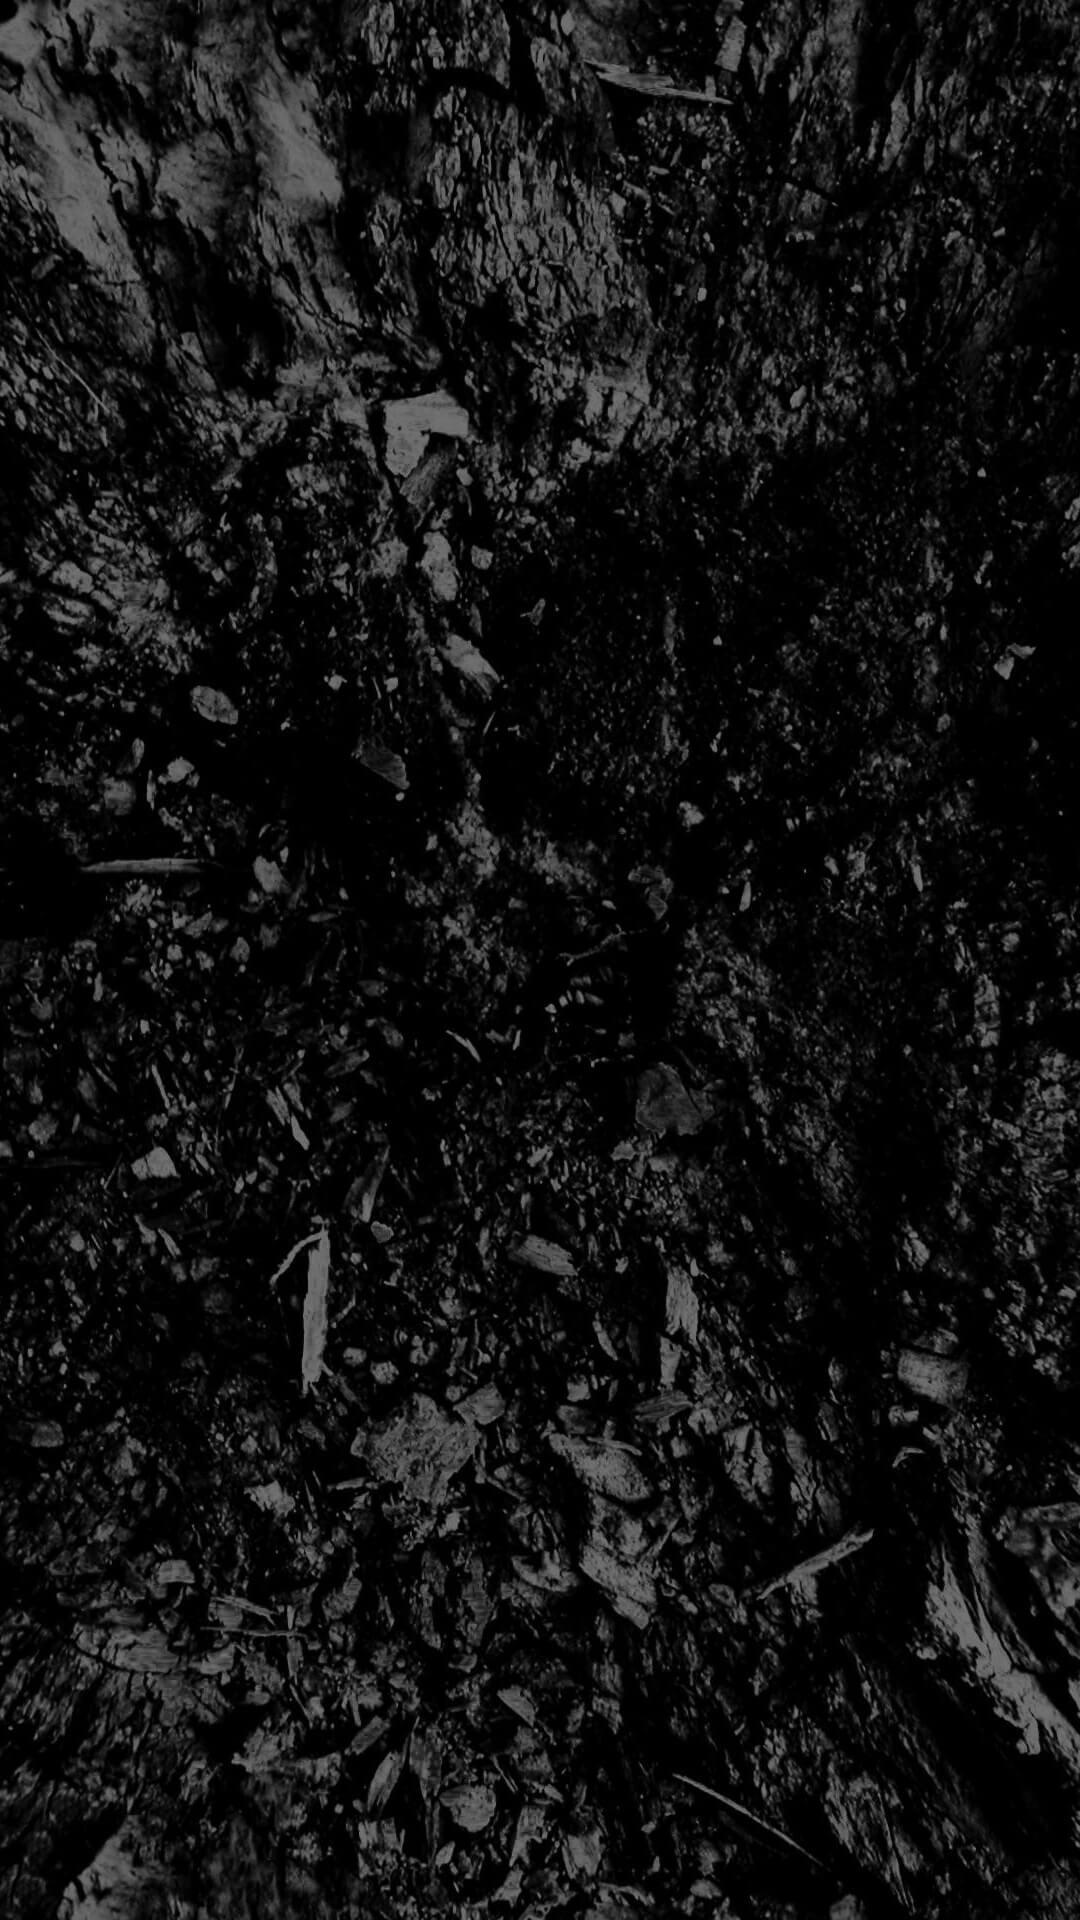 1080x1920 Iphone 5 Wallpaper Tumblr Dark